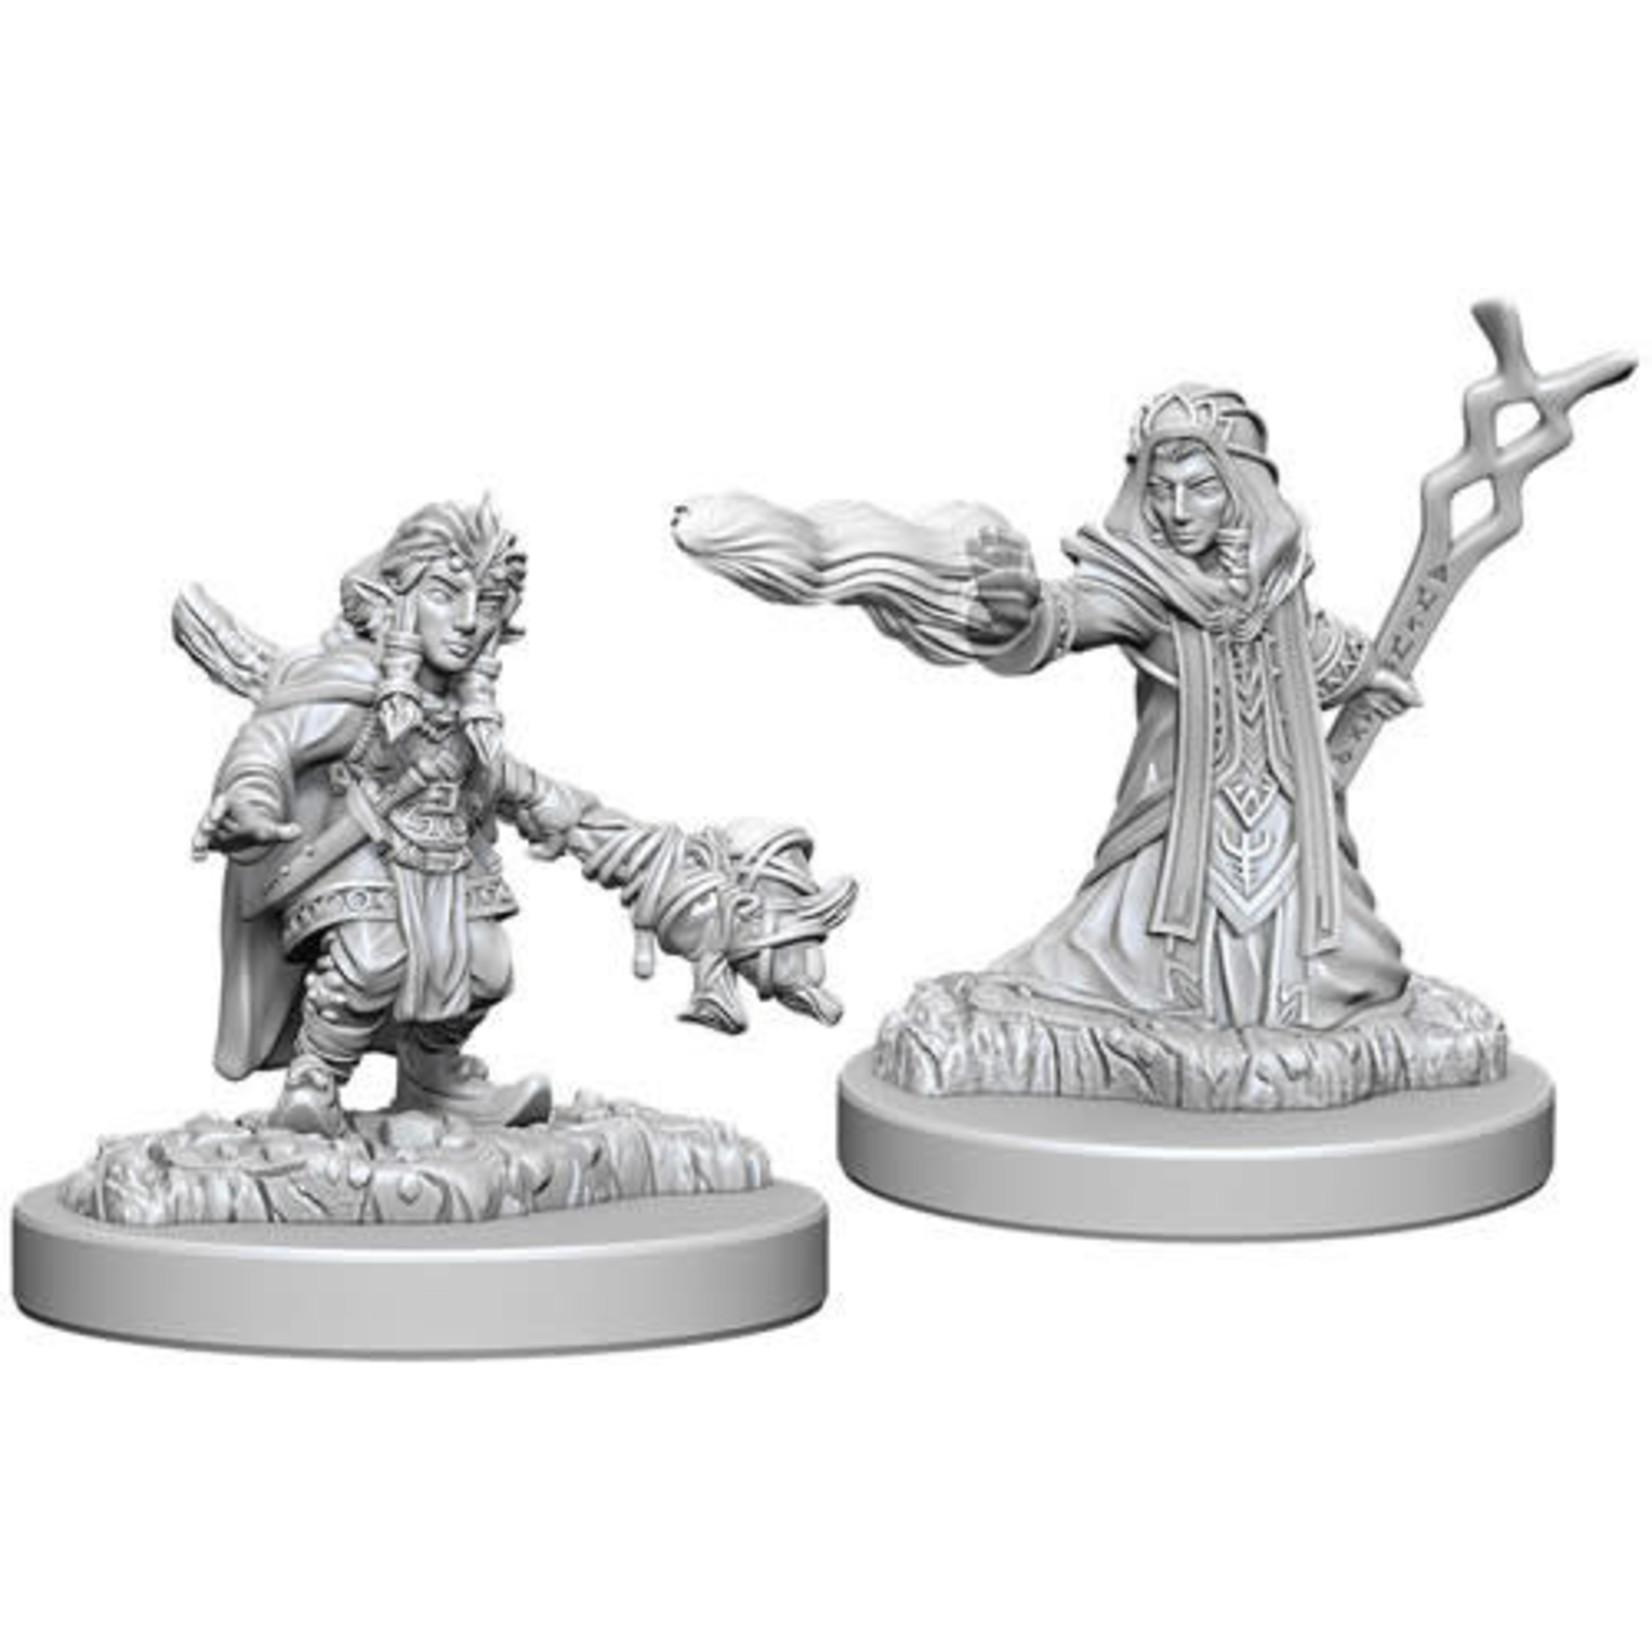 D&D Unpainted Minis: Female Gnome Wizard